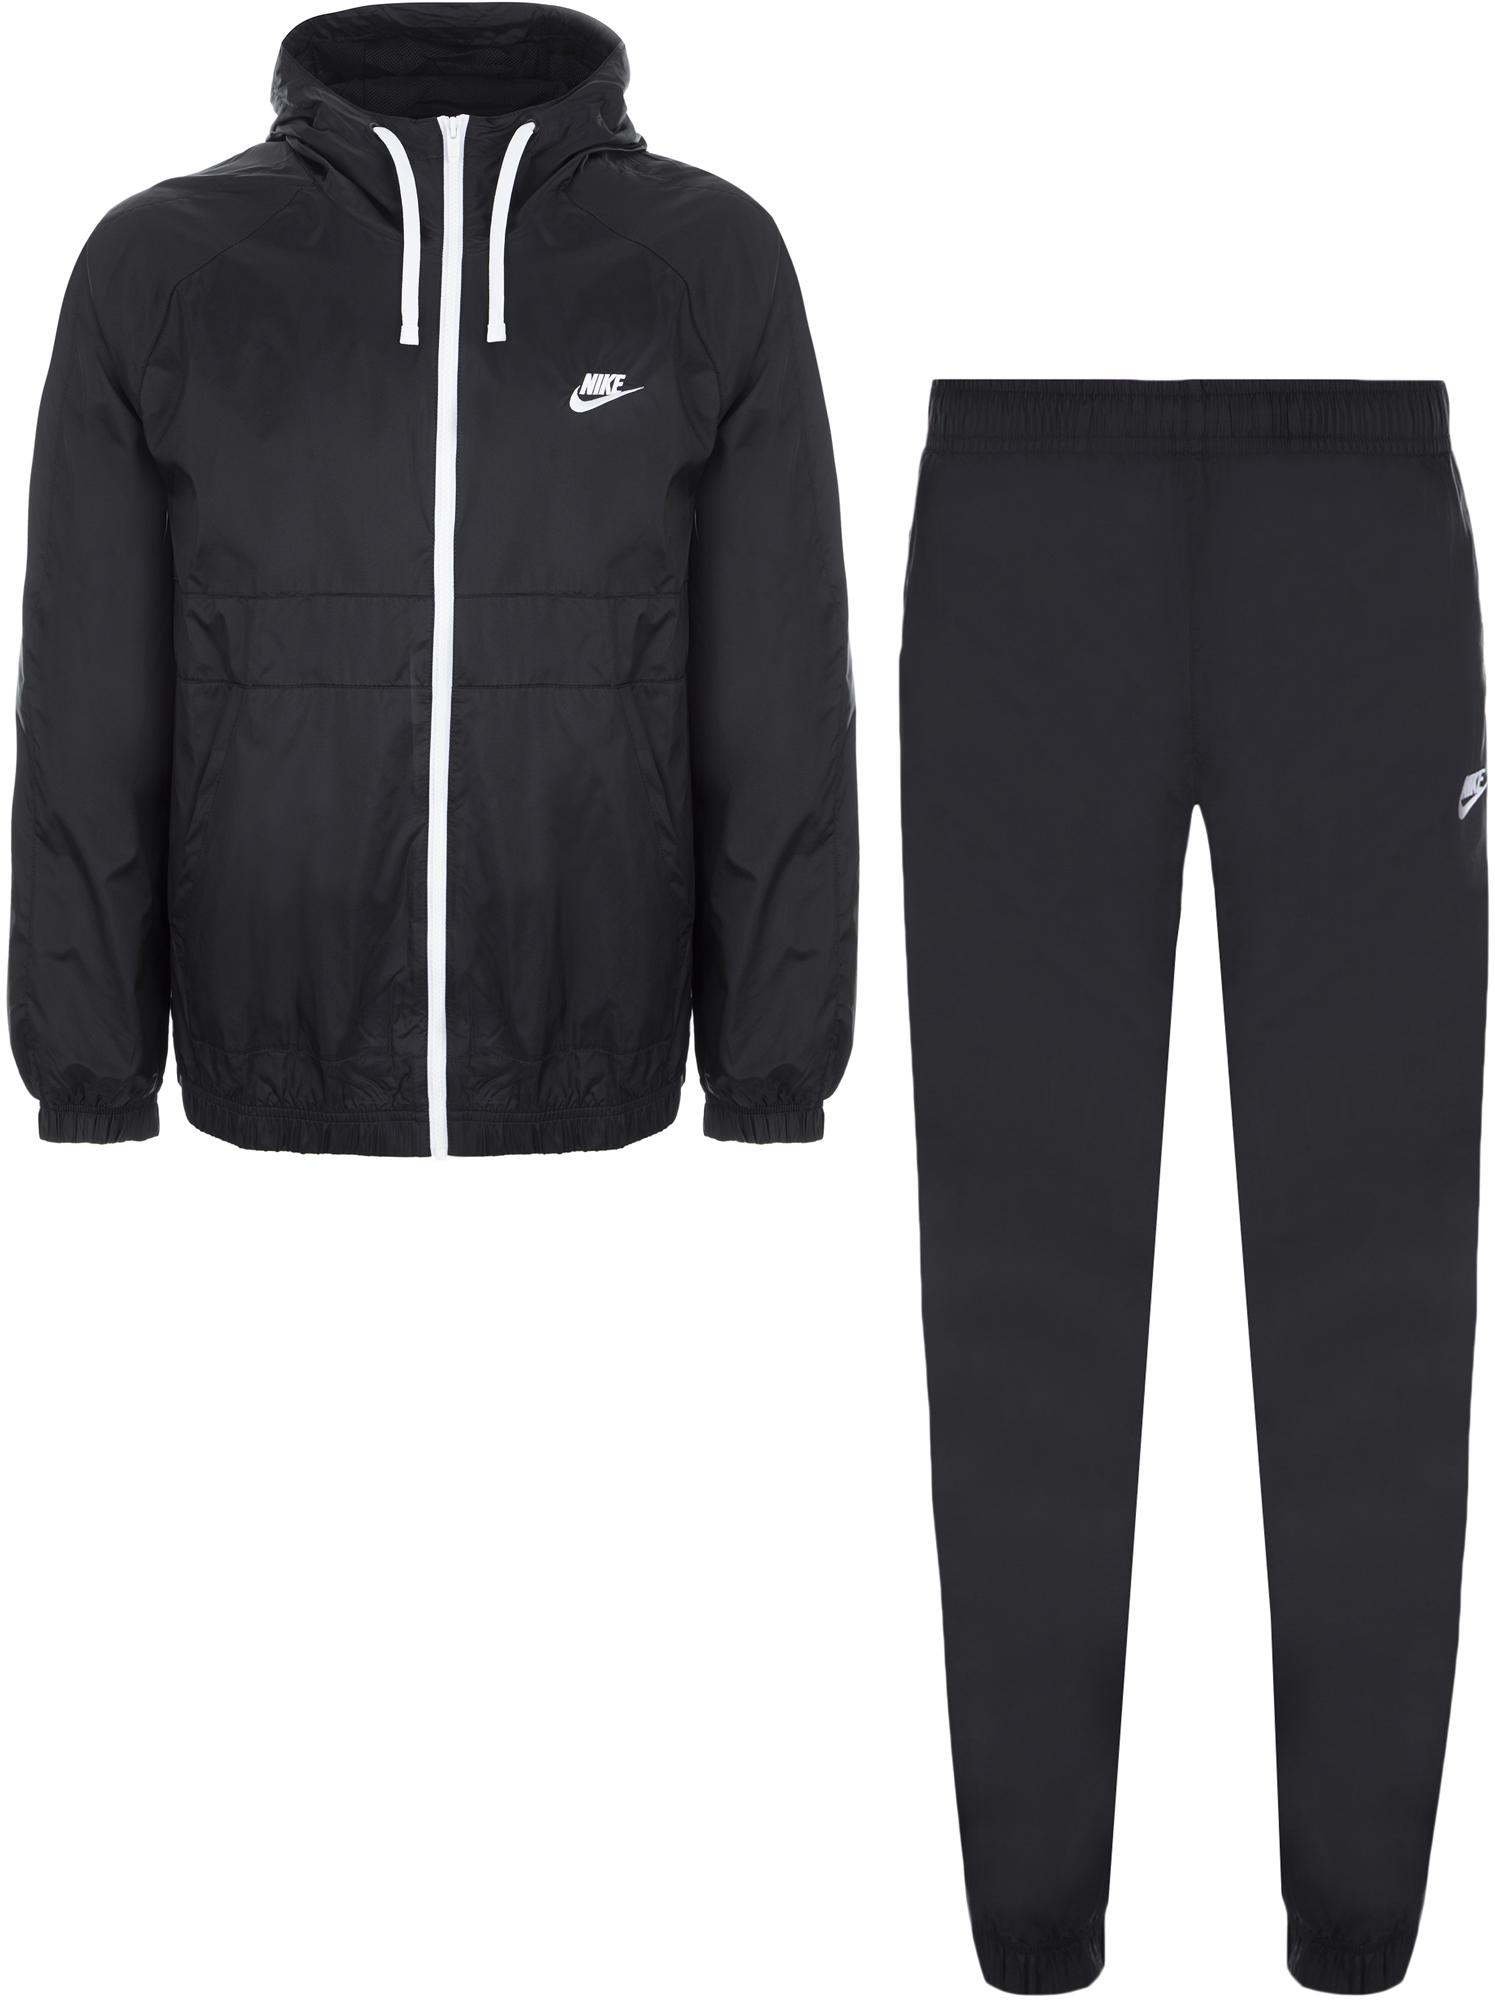 Nike Спортивный костюм мужской Nike, размер 54-56 недорго, оригинальная цена